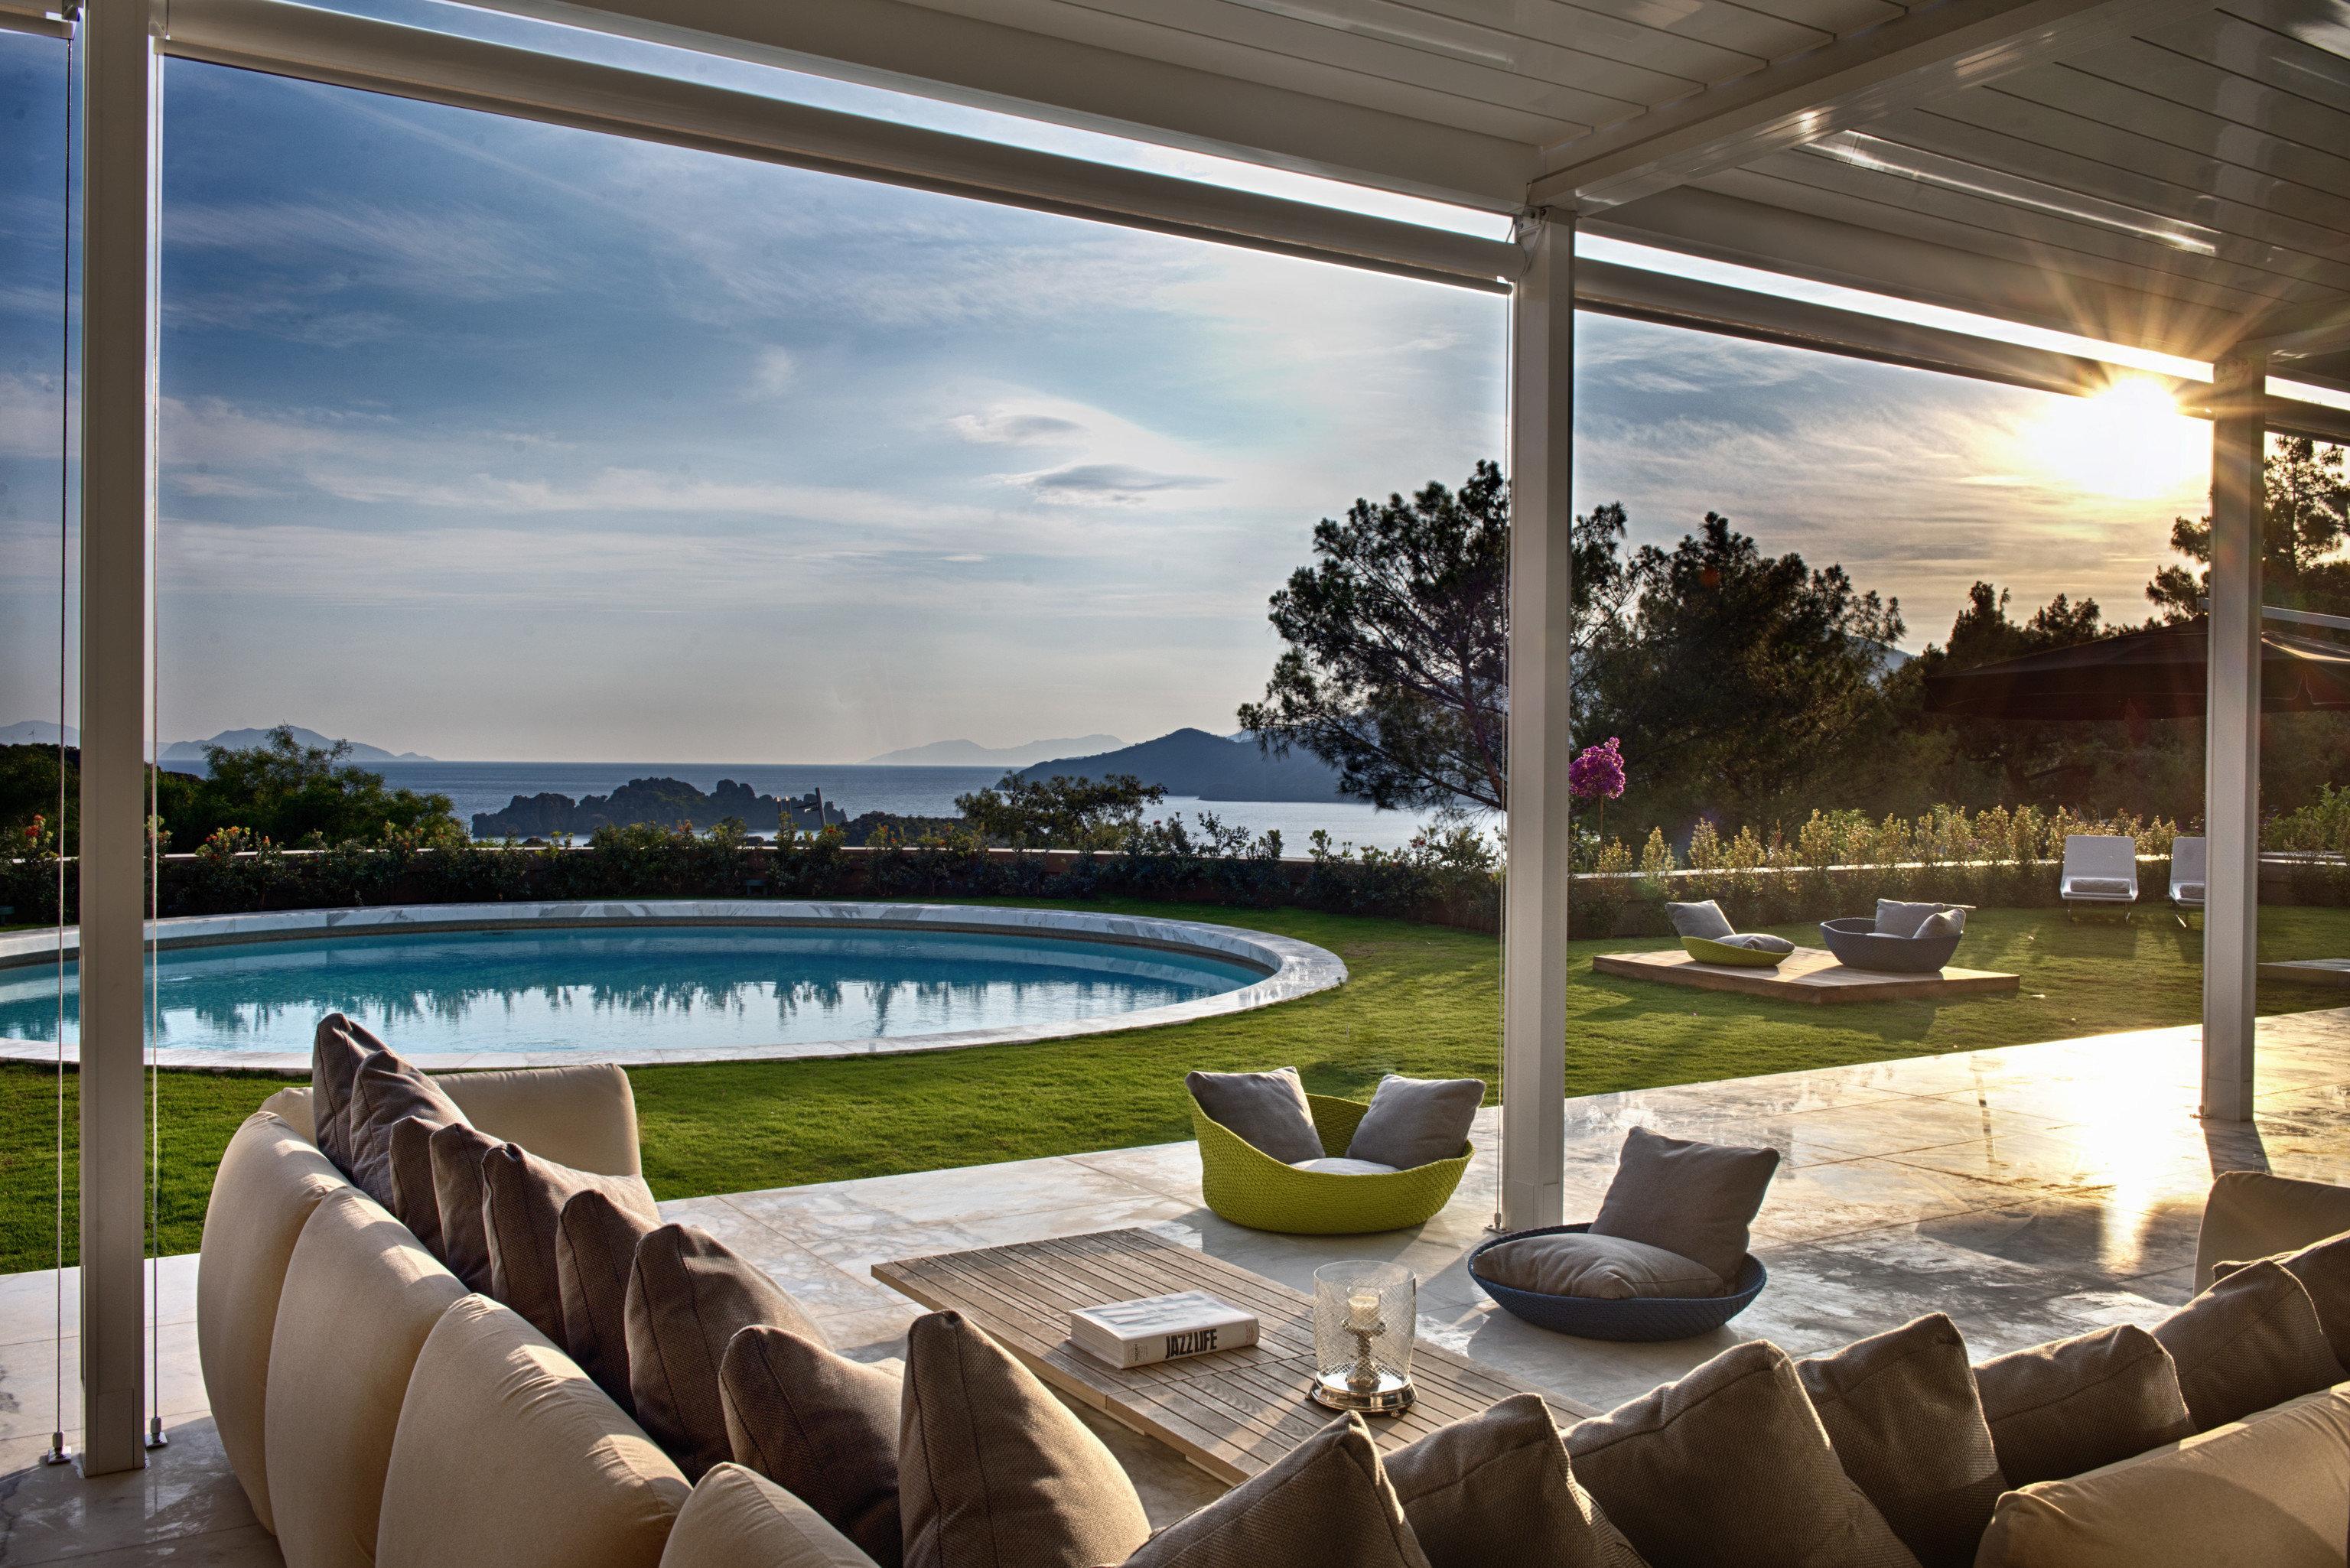 property swimming pool home backyard Villa Resort outdoor structure overlooking